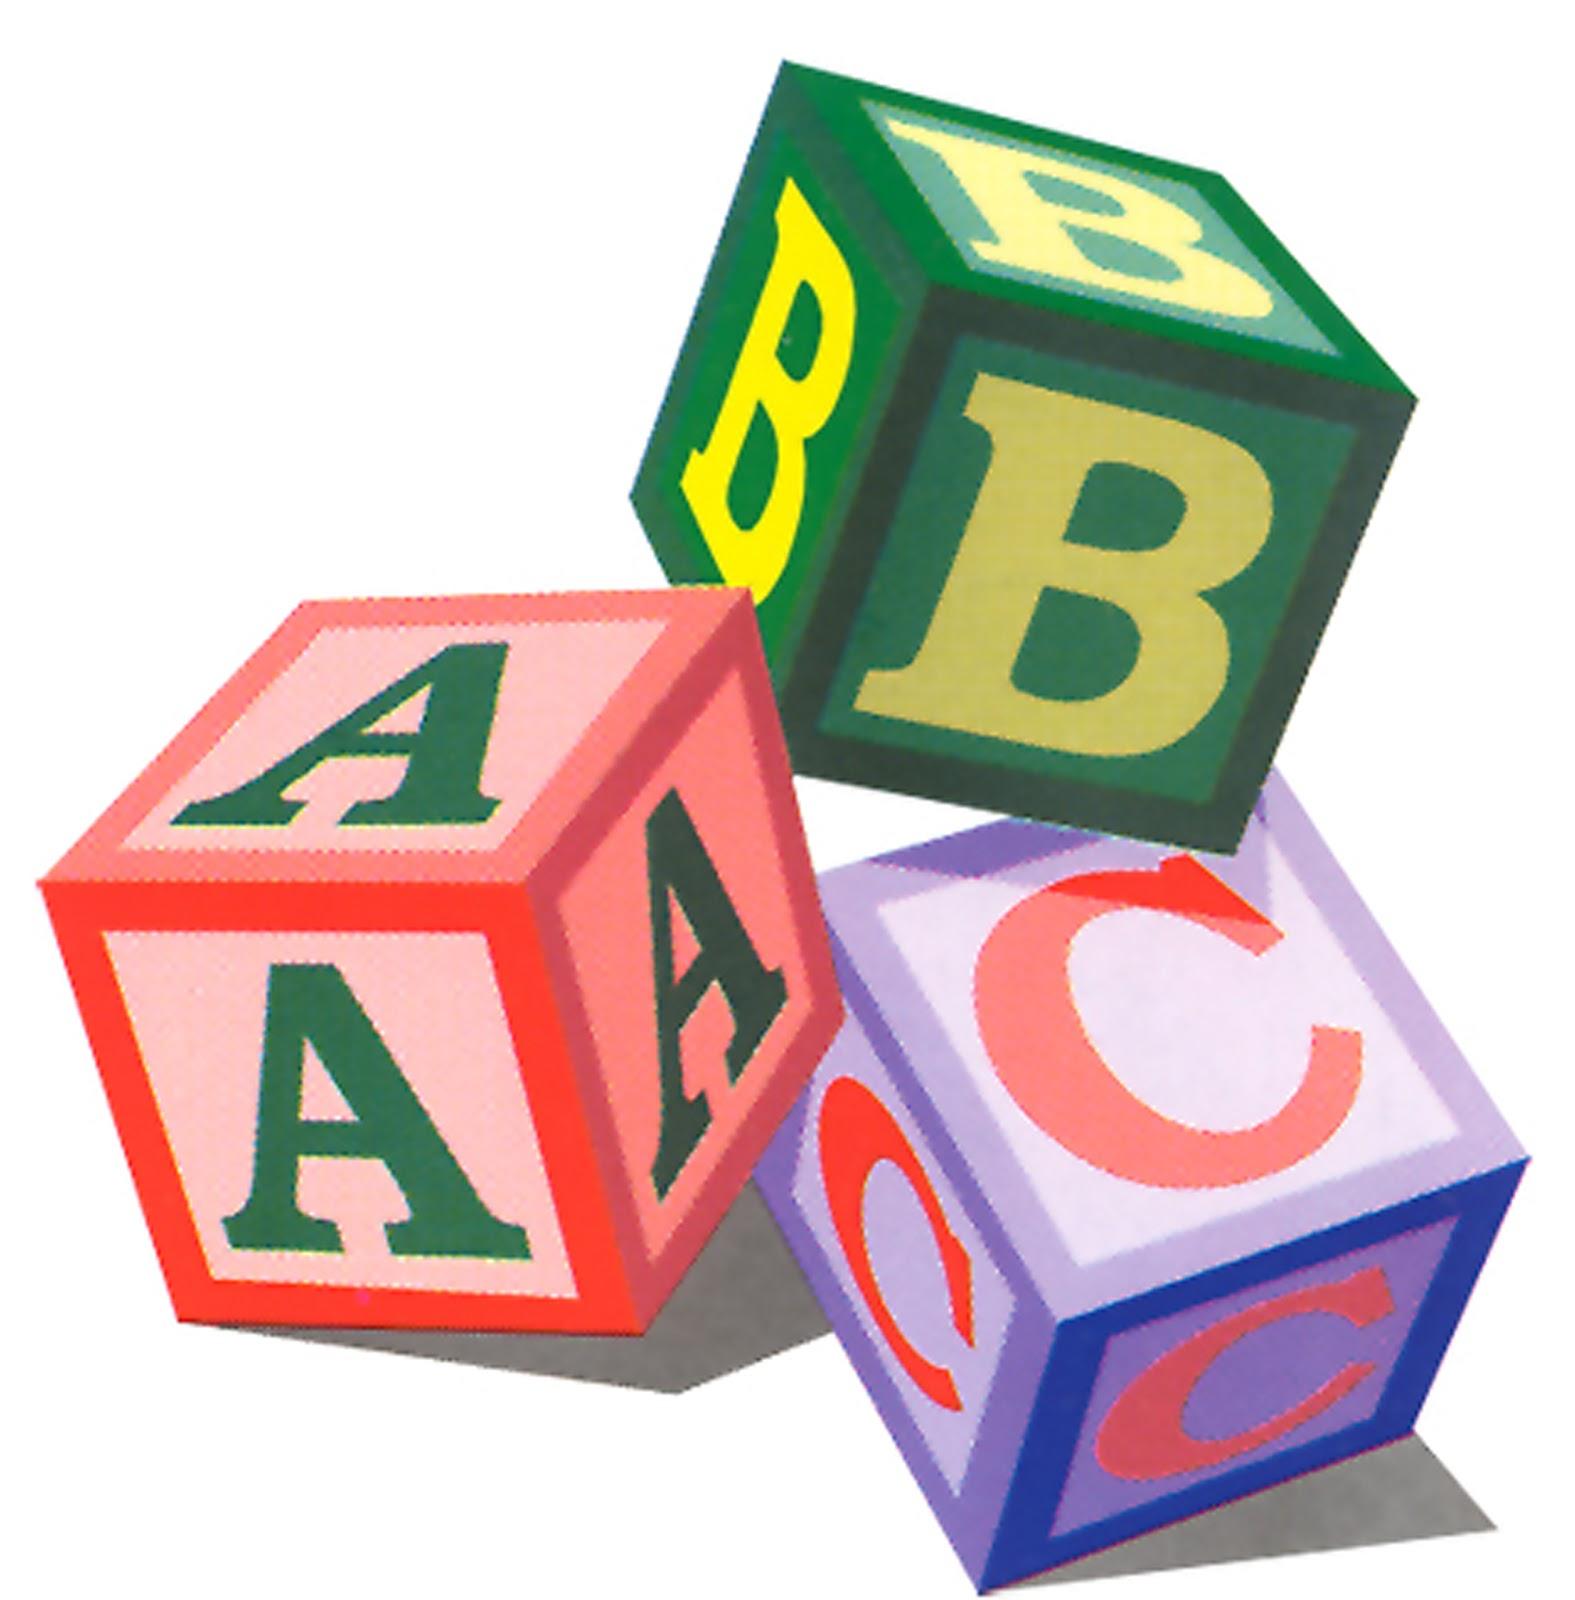 http://4.bp.blogspot.com/_z4BcYVnVAso/TH5vIDQ_nHI/AAAAAAAAAd8/vvDdT8vZtZc/s1600/play_schools_Pre%20schools.jpg